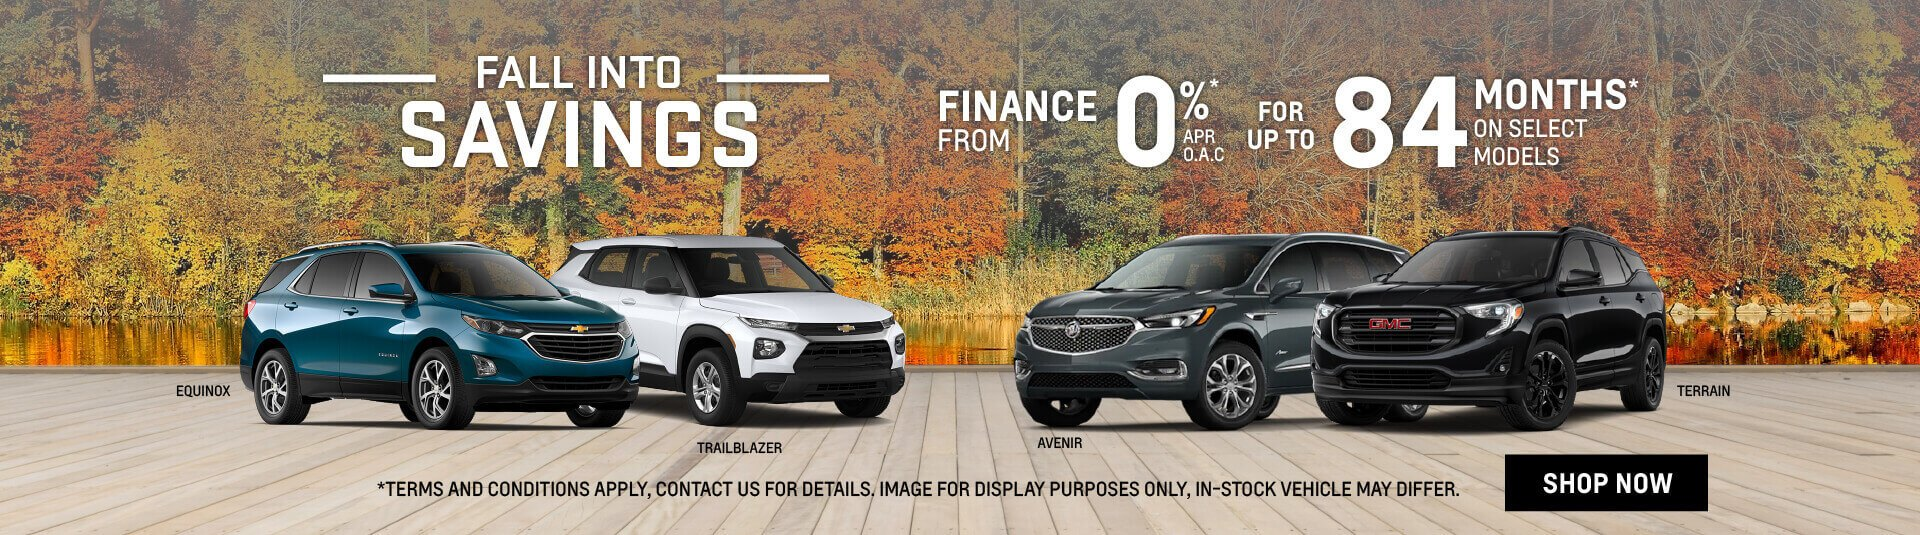 GM Fall Into Savings Sale in Etobicoke, Toronto - Humberview GM